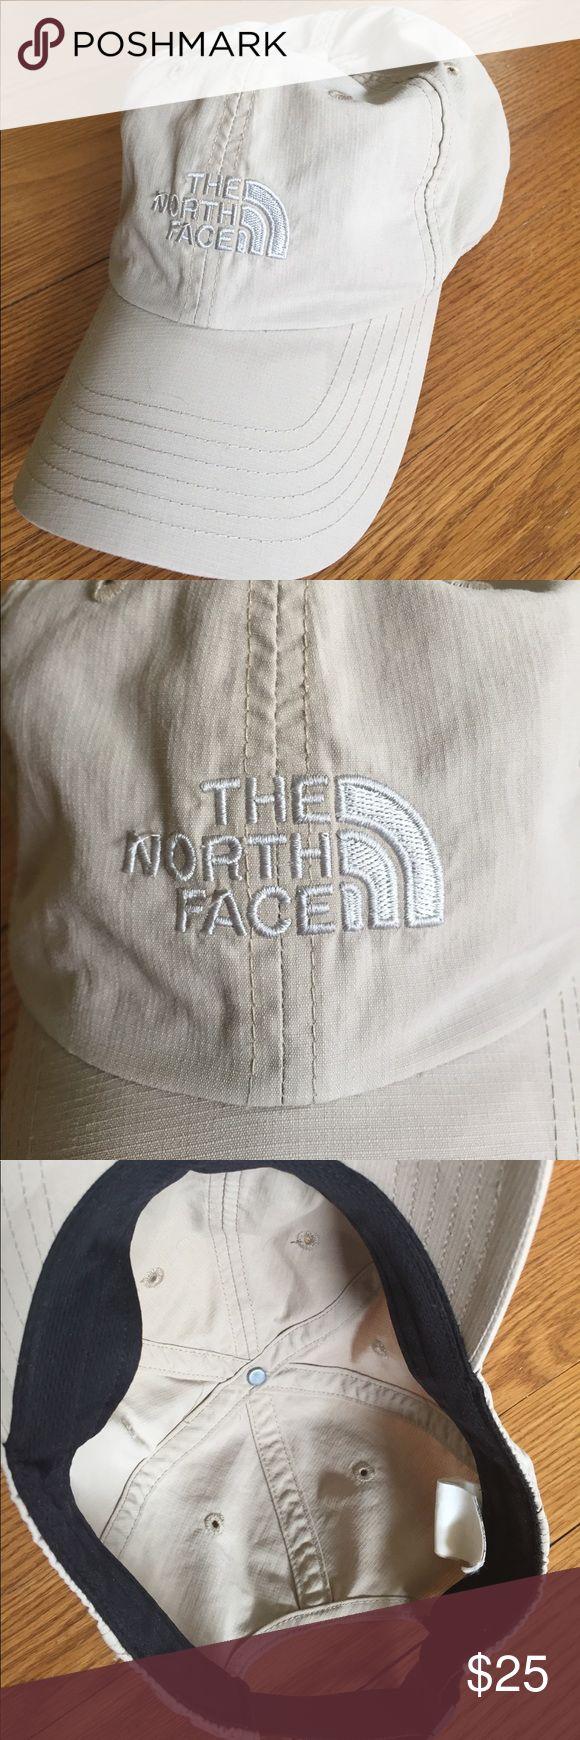 North Face nylon cap Khaki color nylon cap, adjustable buckle strap.  Size is S/M. The North Face Accessories Hats